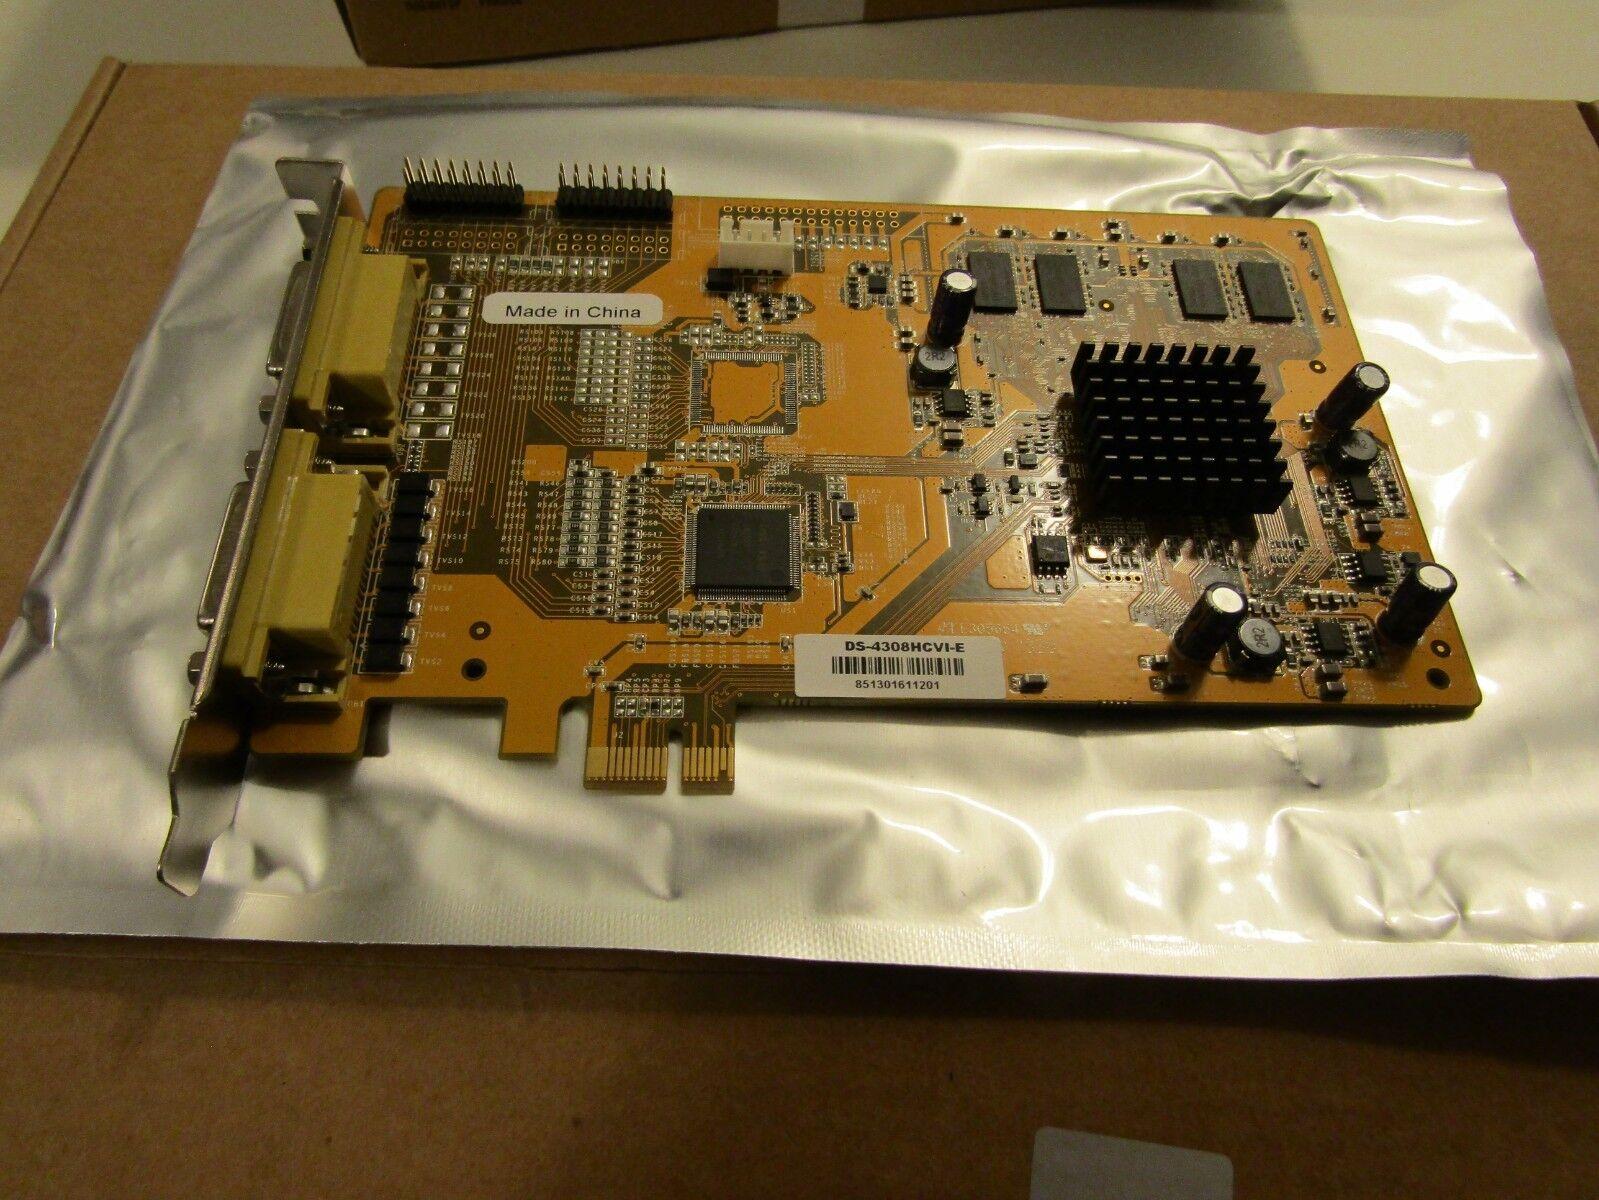 Hikvision DS-4308HCVI-E 8 Camera H.264 PCI-E Compression DVR Card